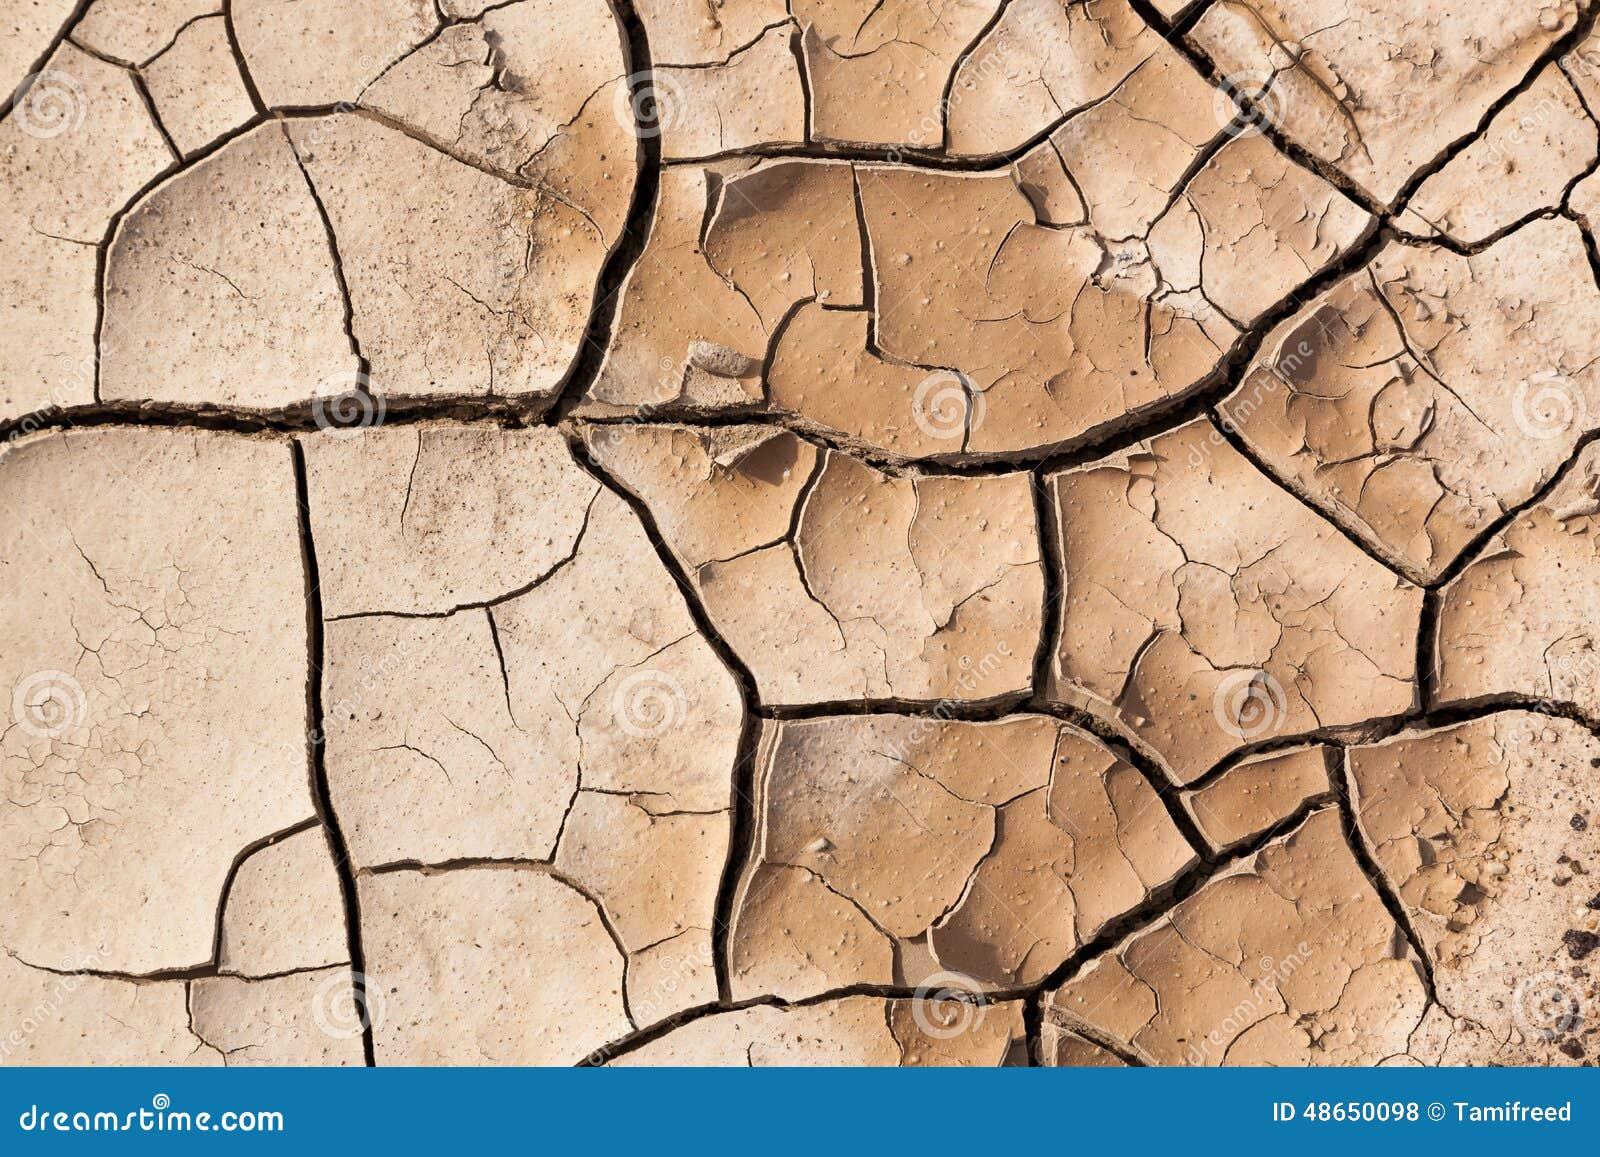 Muddy Cracked Earth